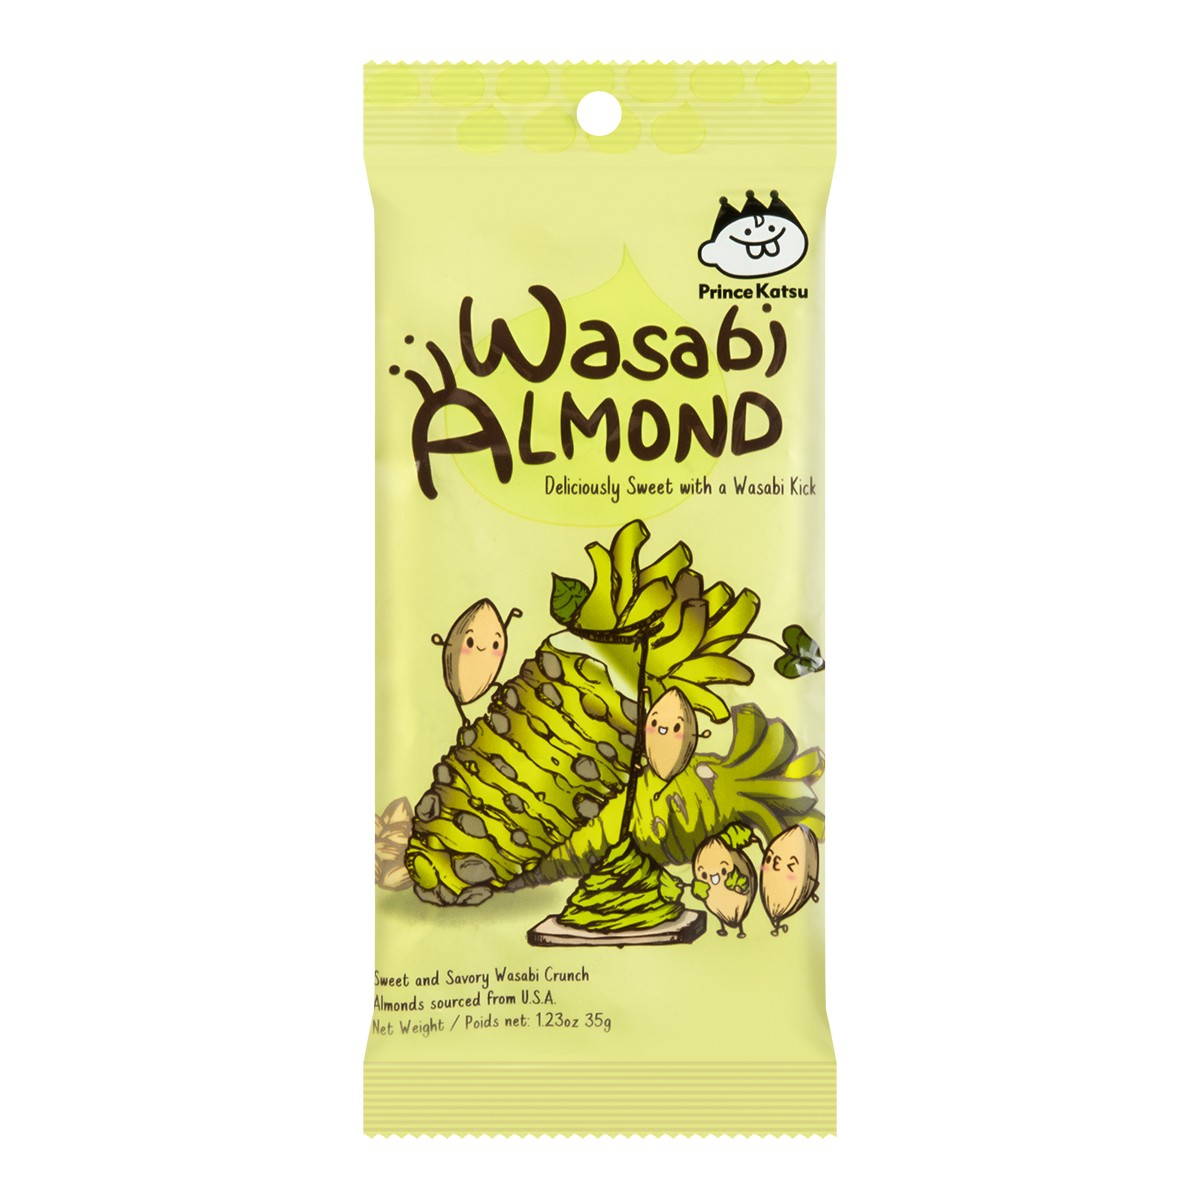 Wasabi Almond 35g